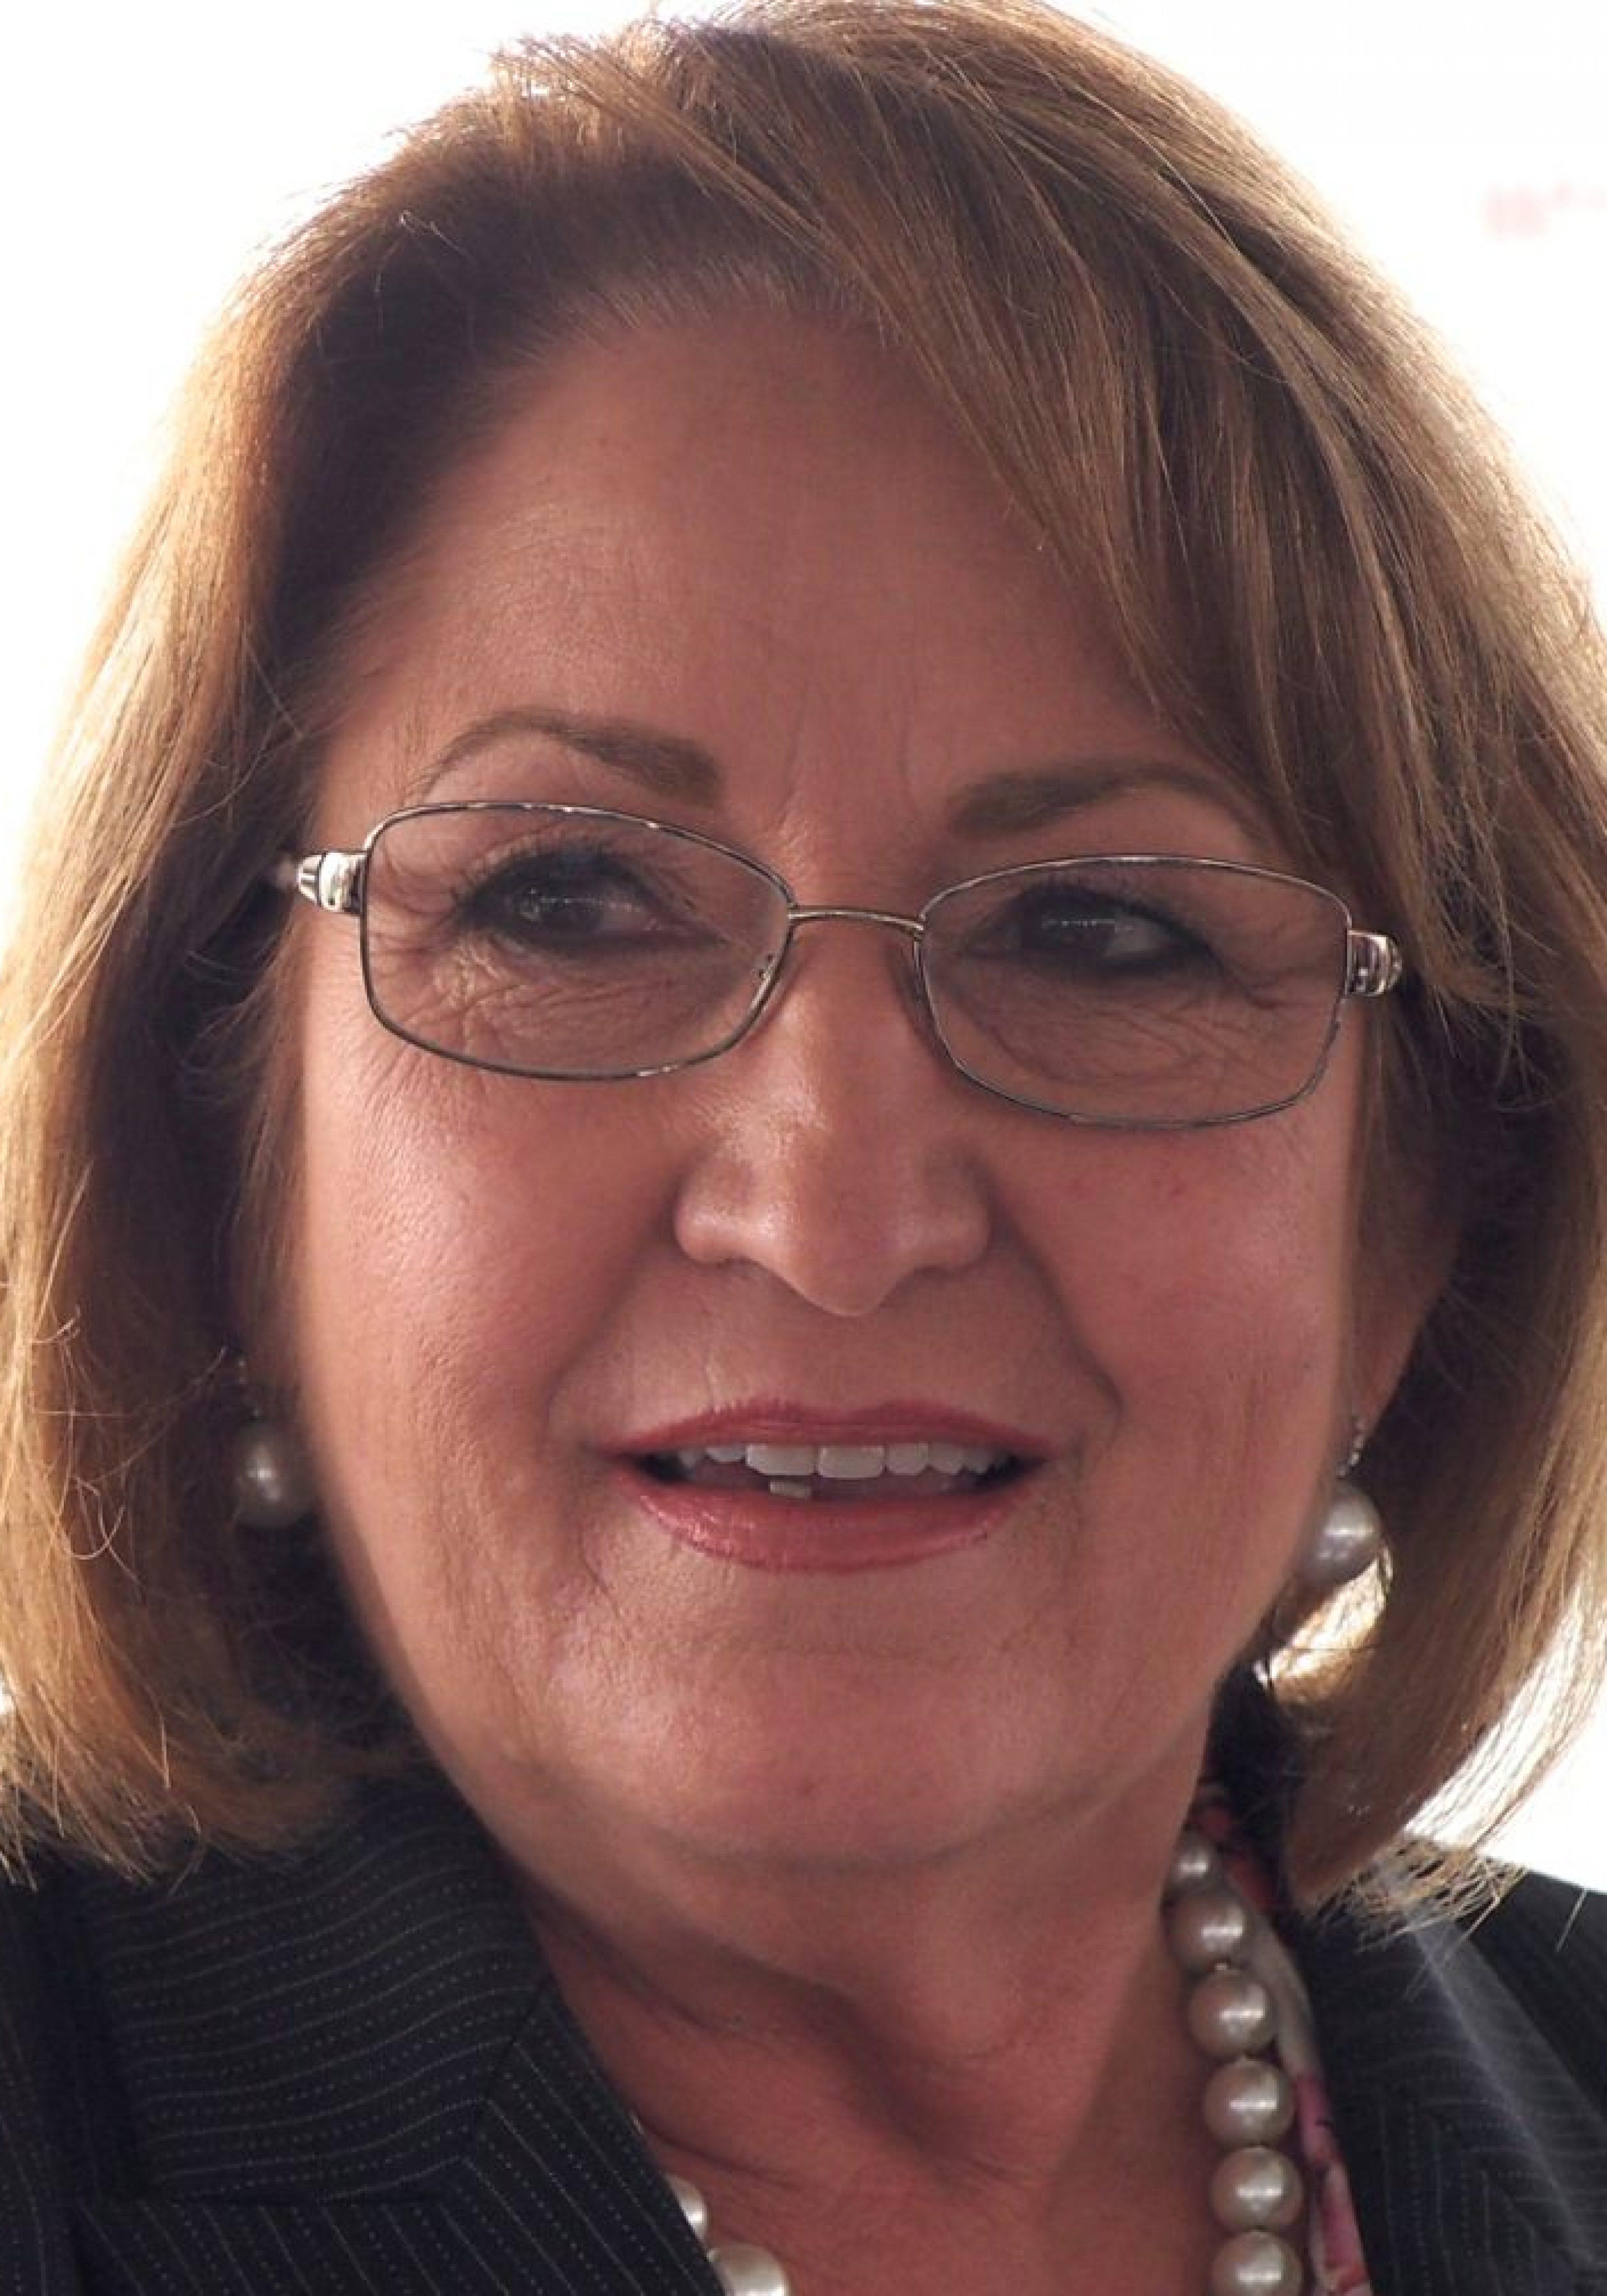 Teresa-Jacobs-3-3500x5000.jpg